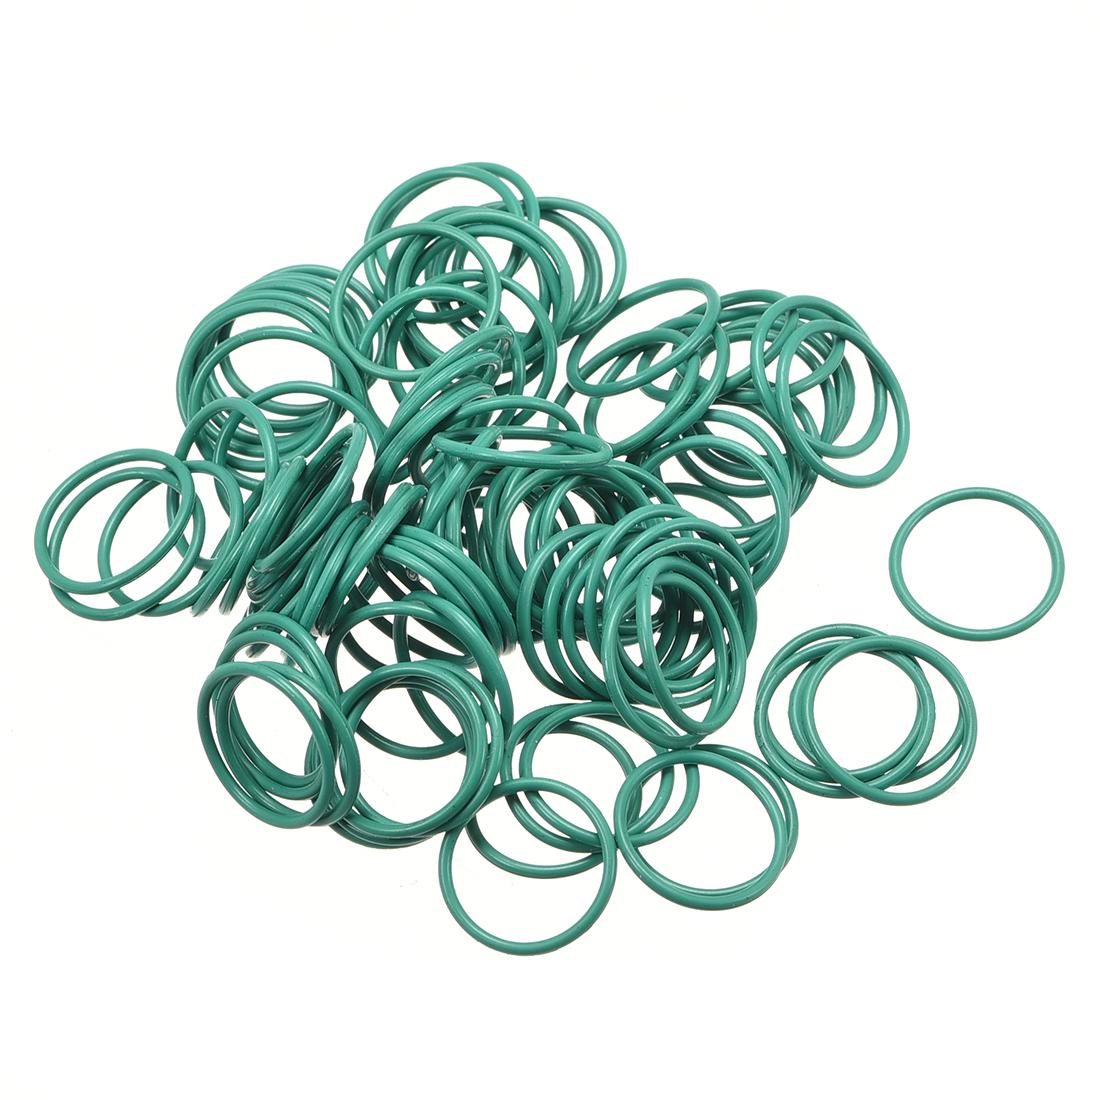 100Pcs 13mm x 1mm FKM O-rings Heat Resistant Sealing Ring Grommets Green